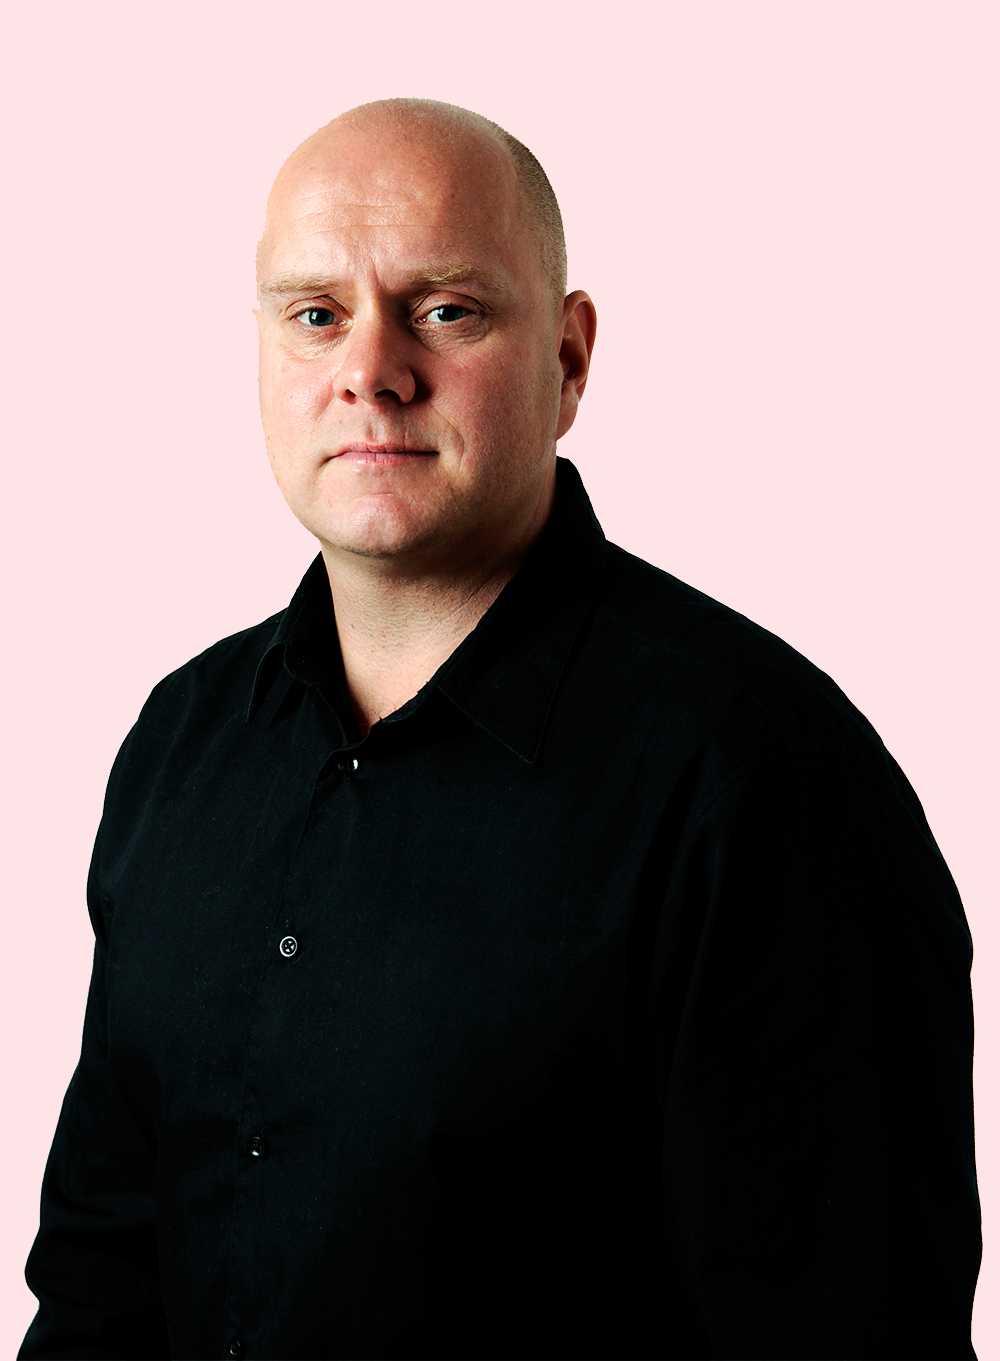 Sportbladets krönikör Tomas Ros.